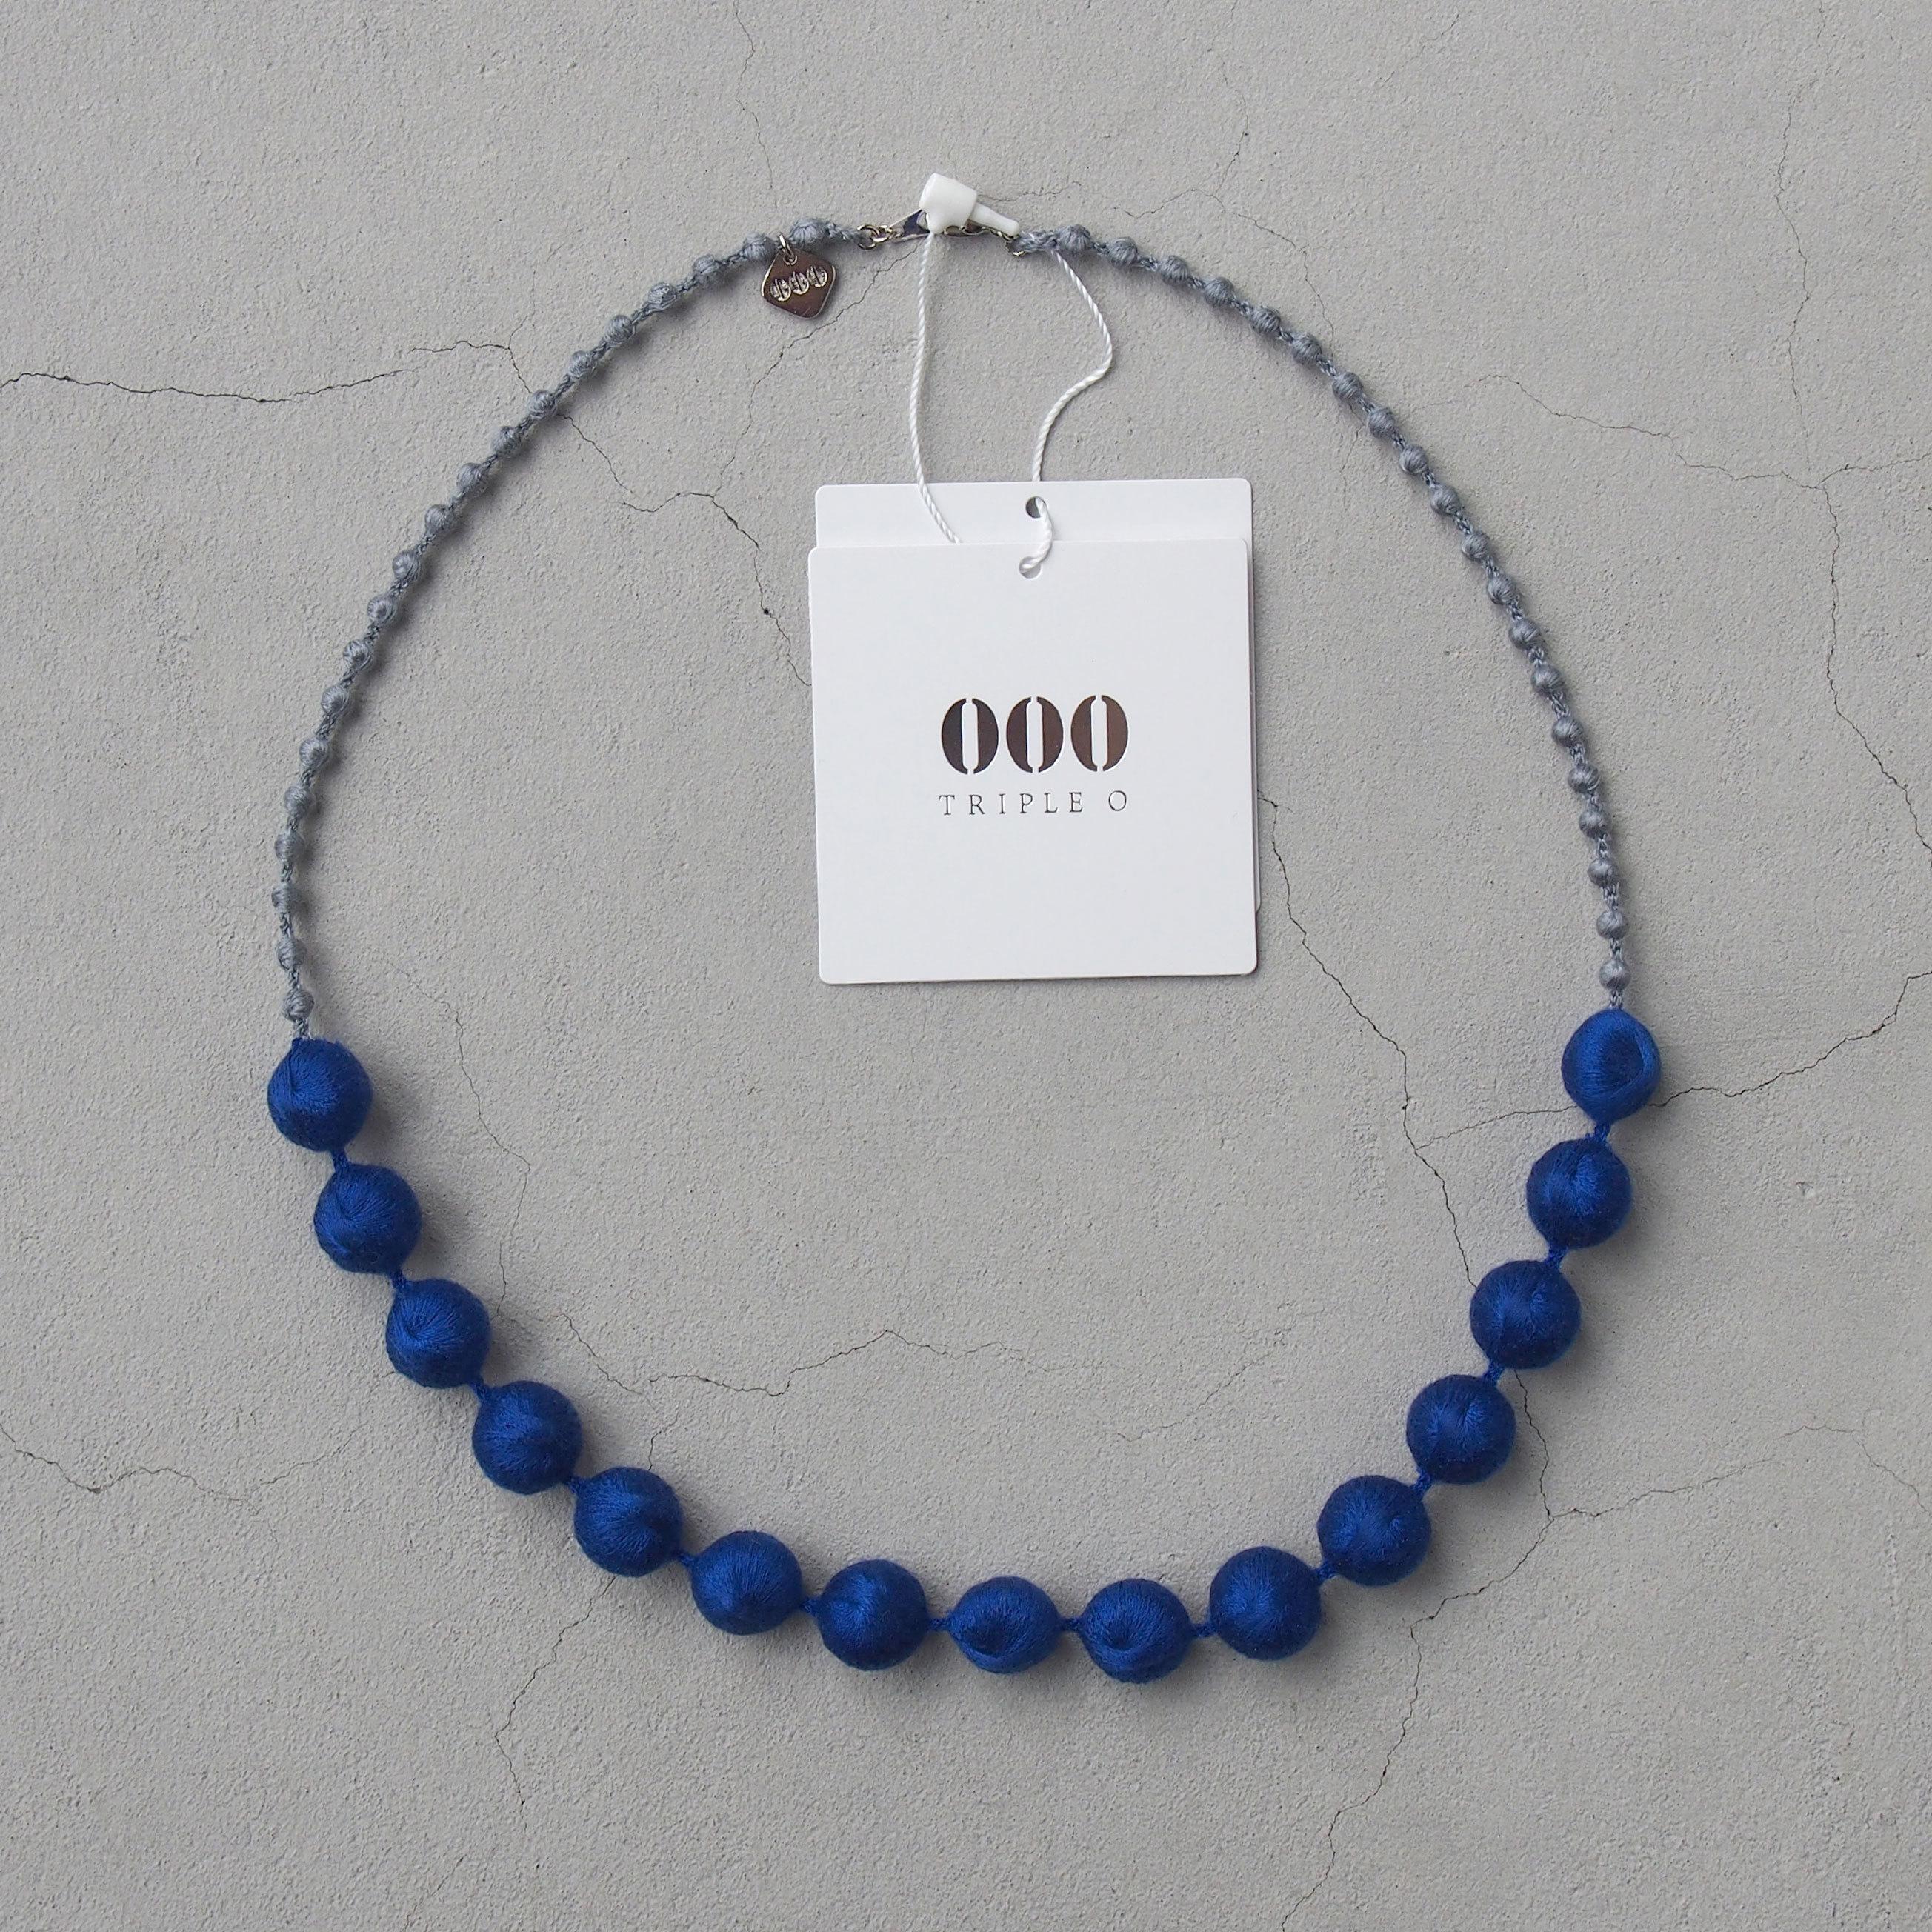 OOO Sphere Colour combi ネックレス ブルー